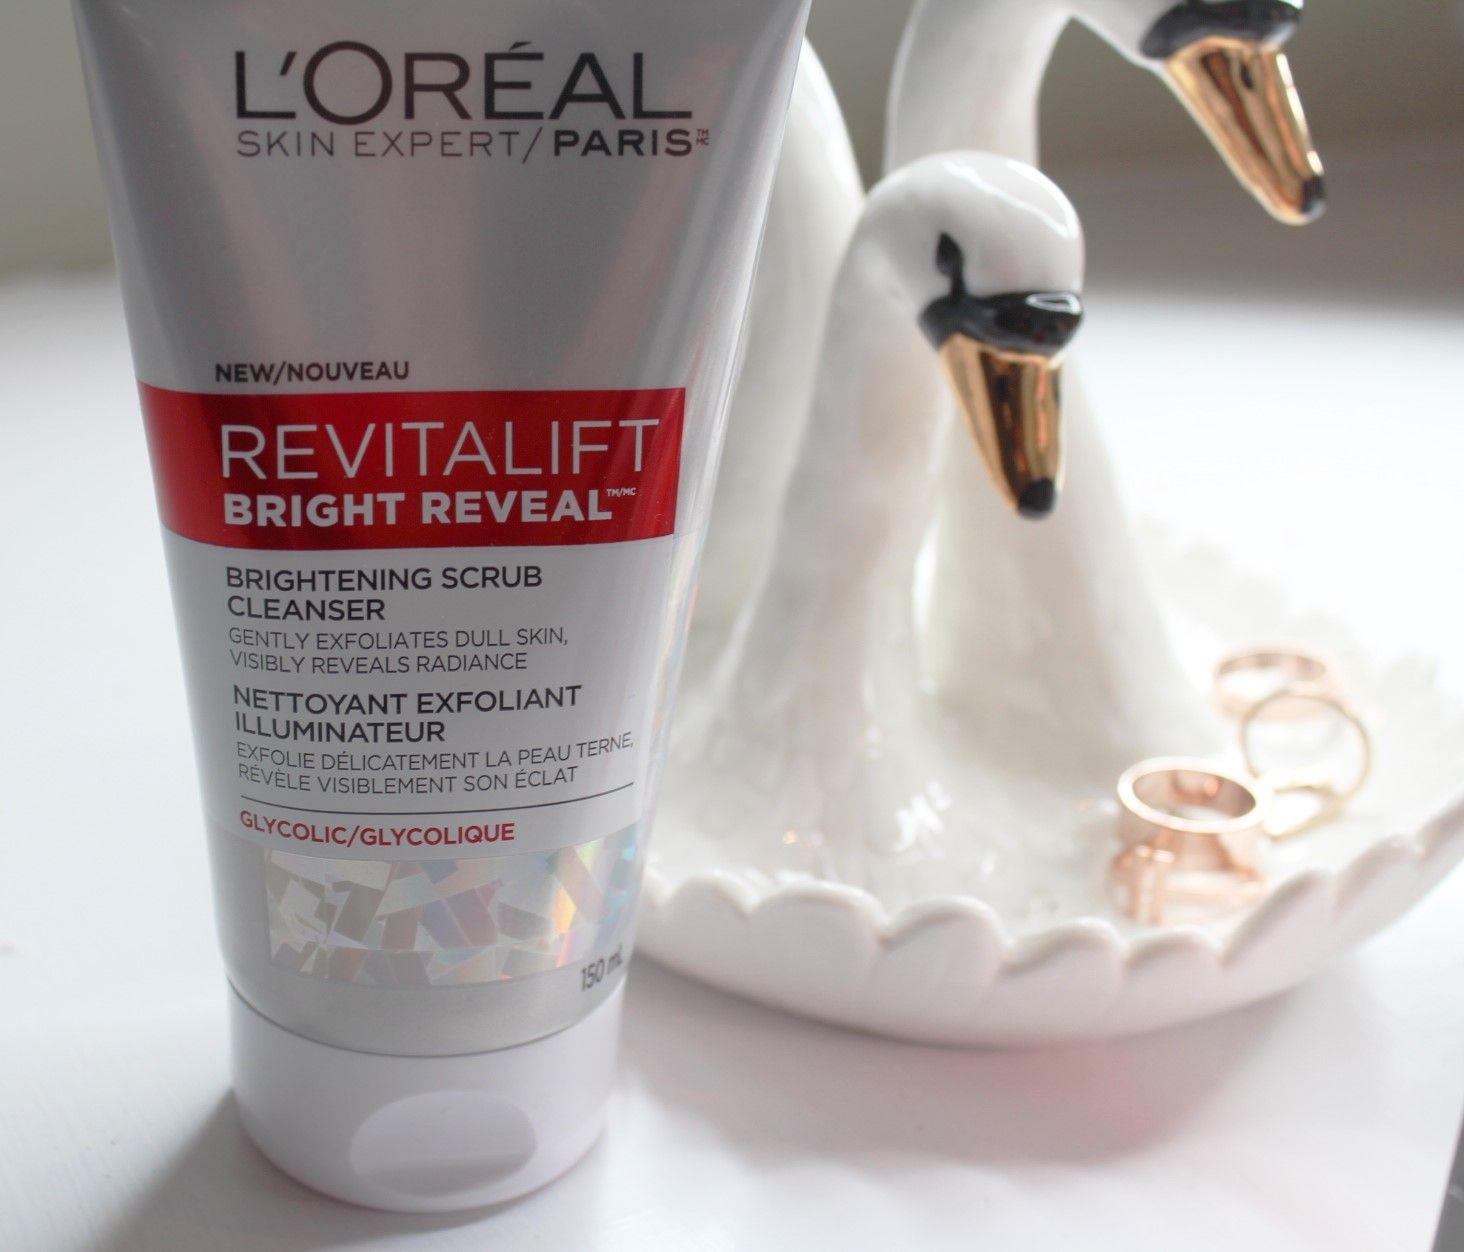 L'Oréal Revitalift Bright Reveal VoxBox [Review] Loreal